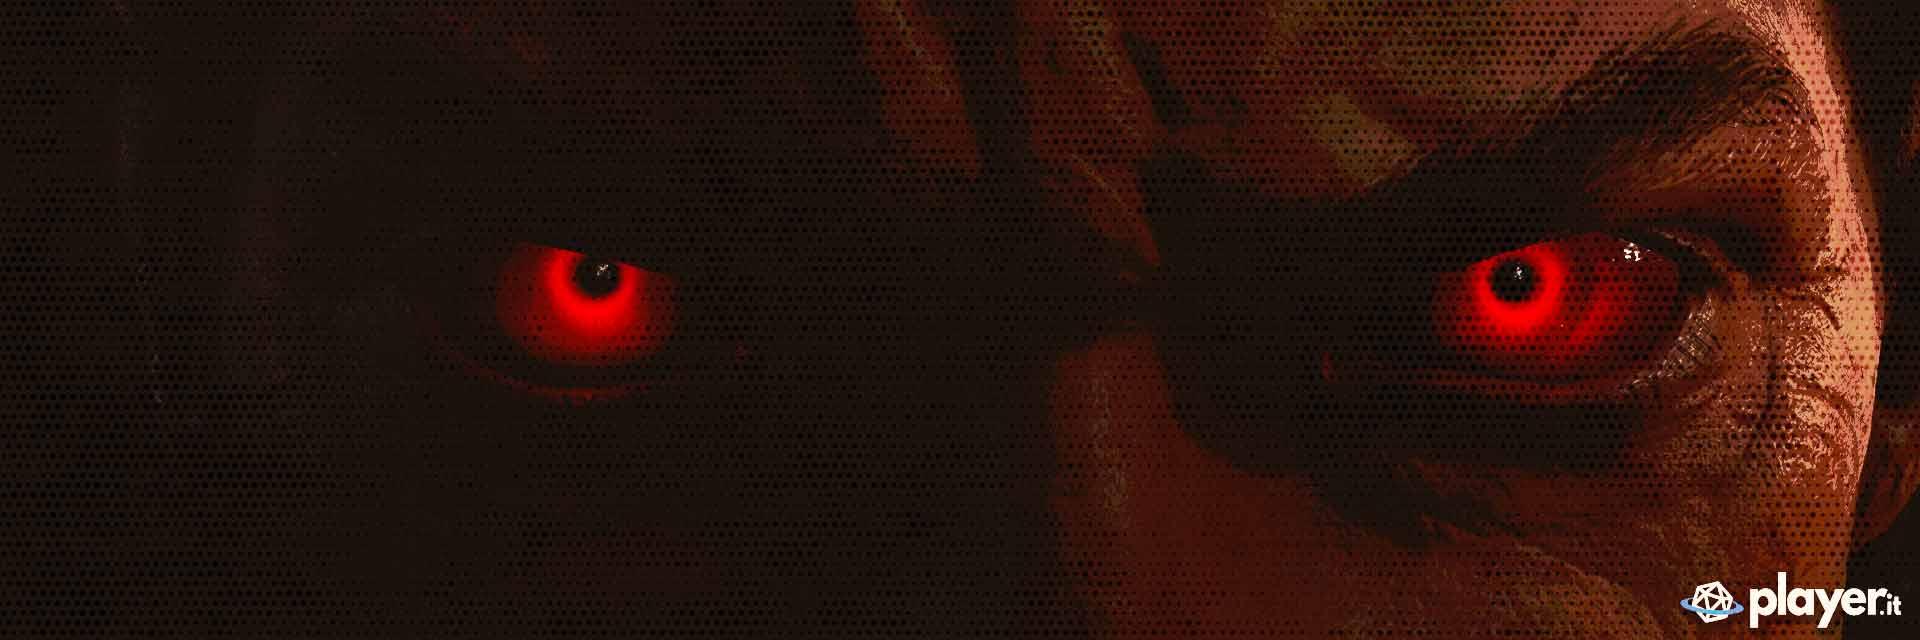 immagine in evidenza del gioco Doom Eternal (DLC) - The Ancient Gods part 1